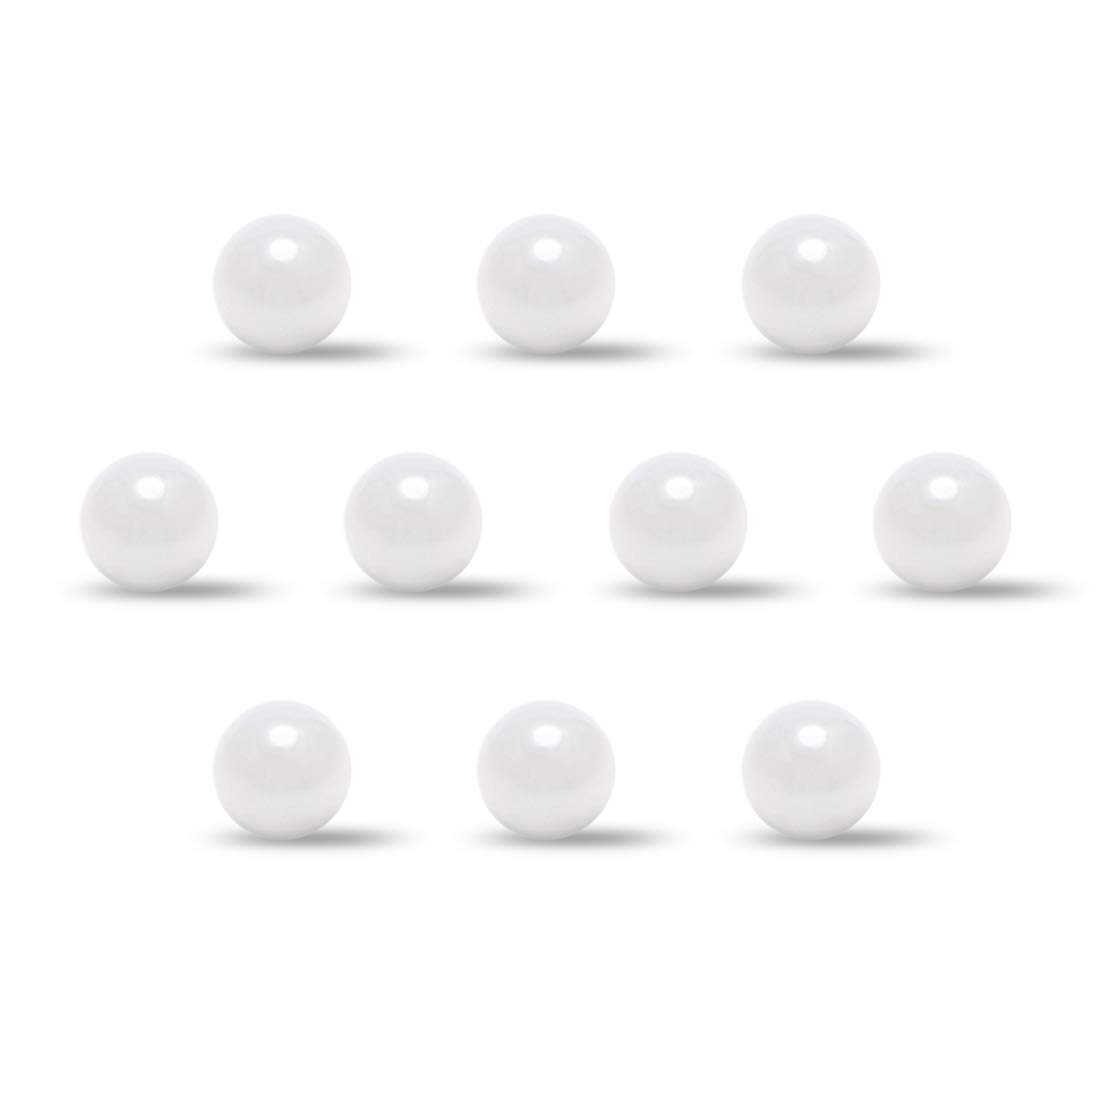 uxcell 2mm Ceramic Bearing Balls ZRO2 Zirconium Oxide Ball G5 Precision 3pcs